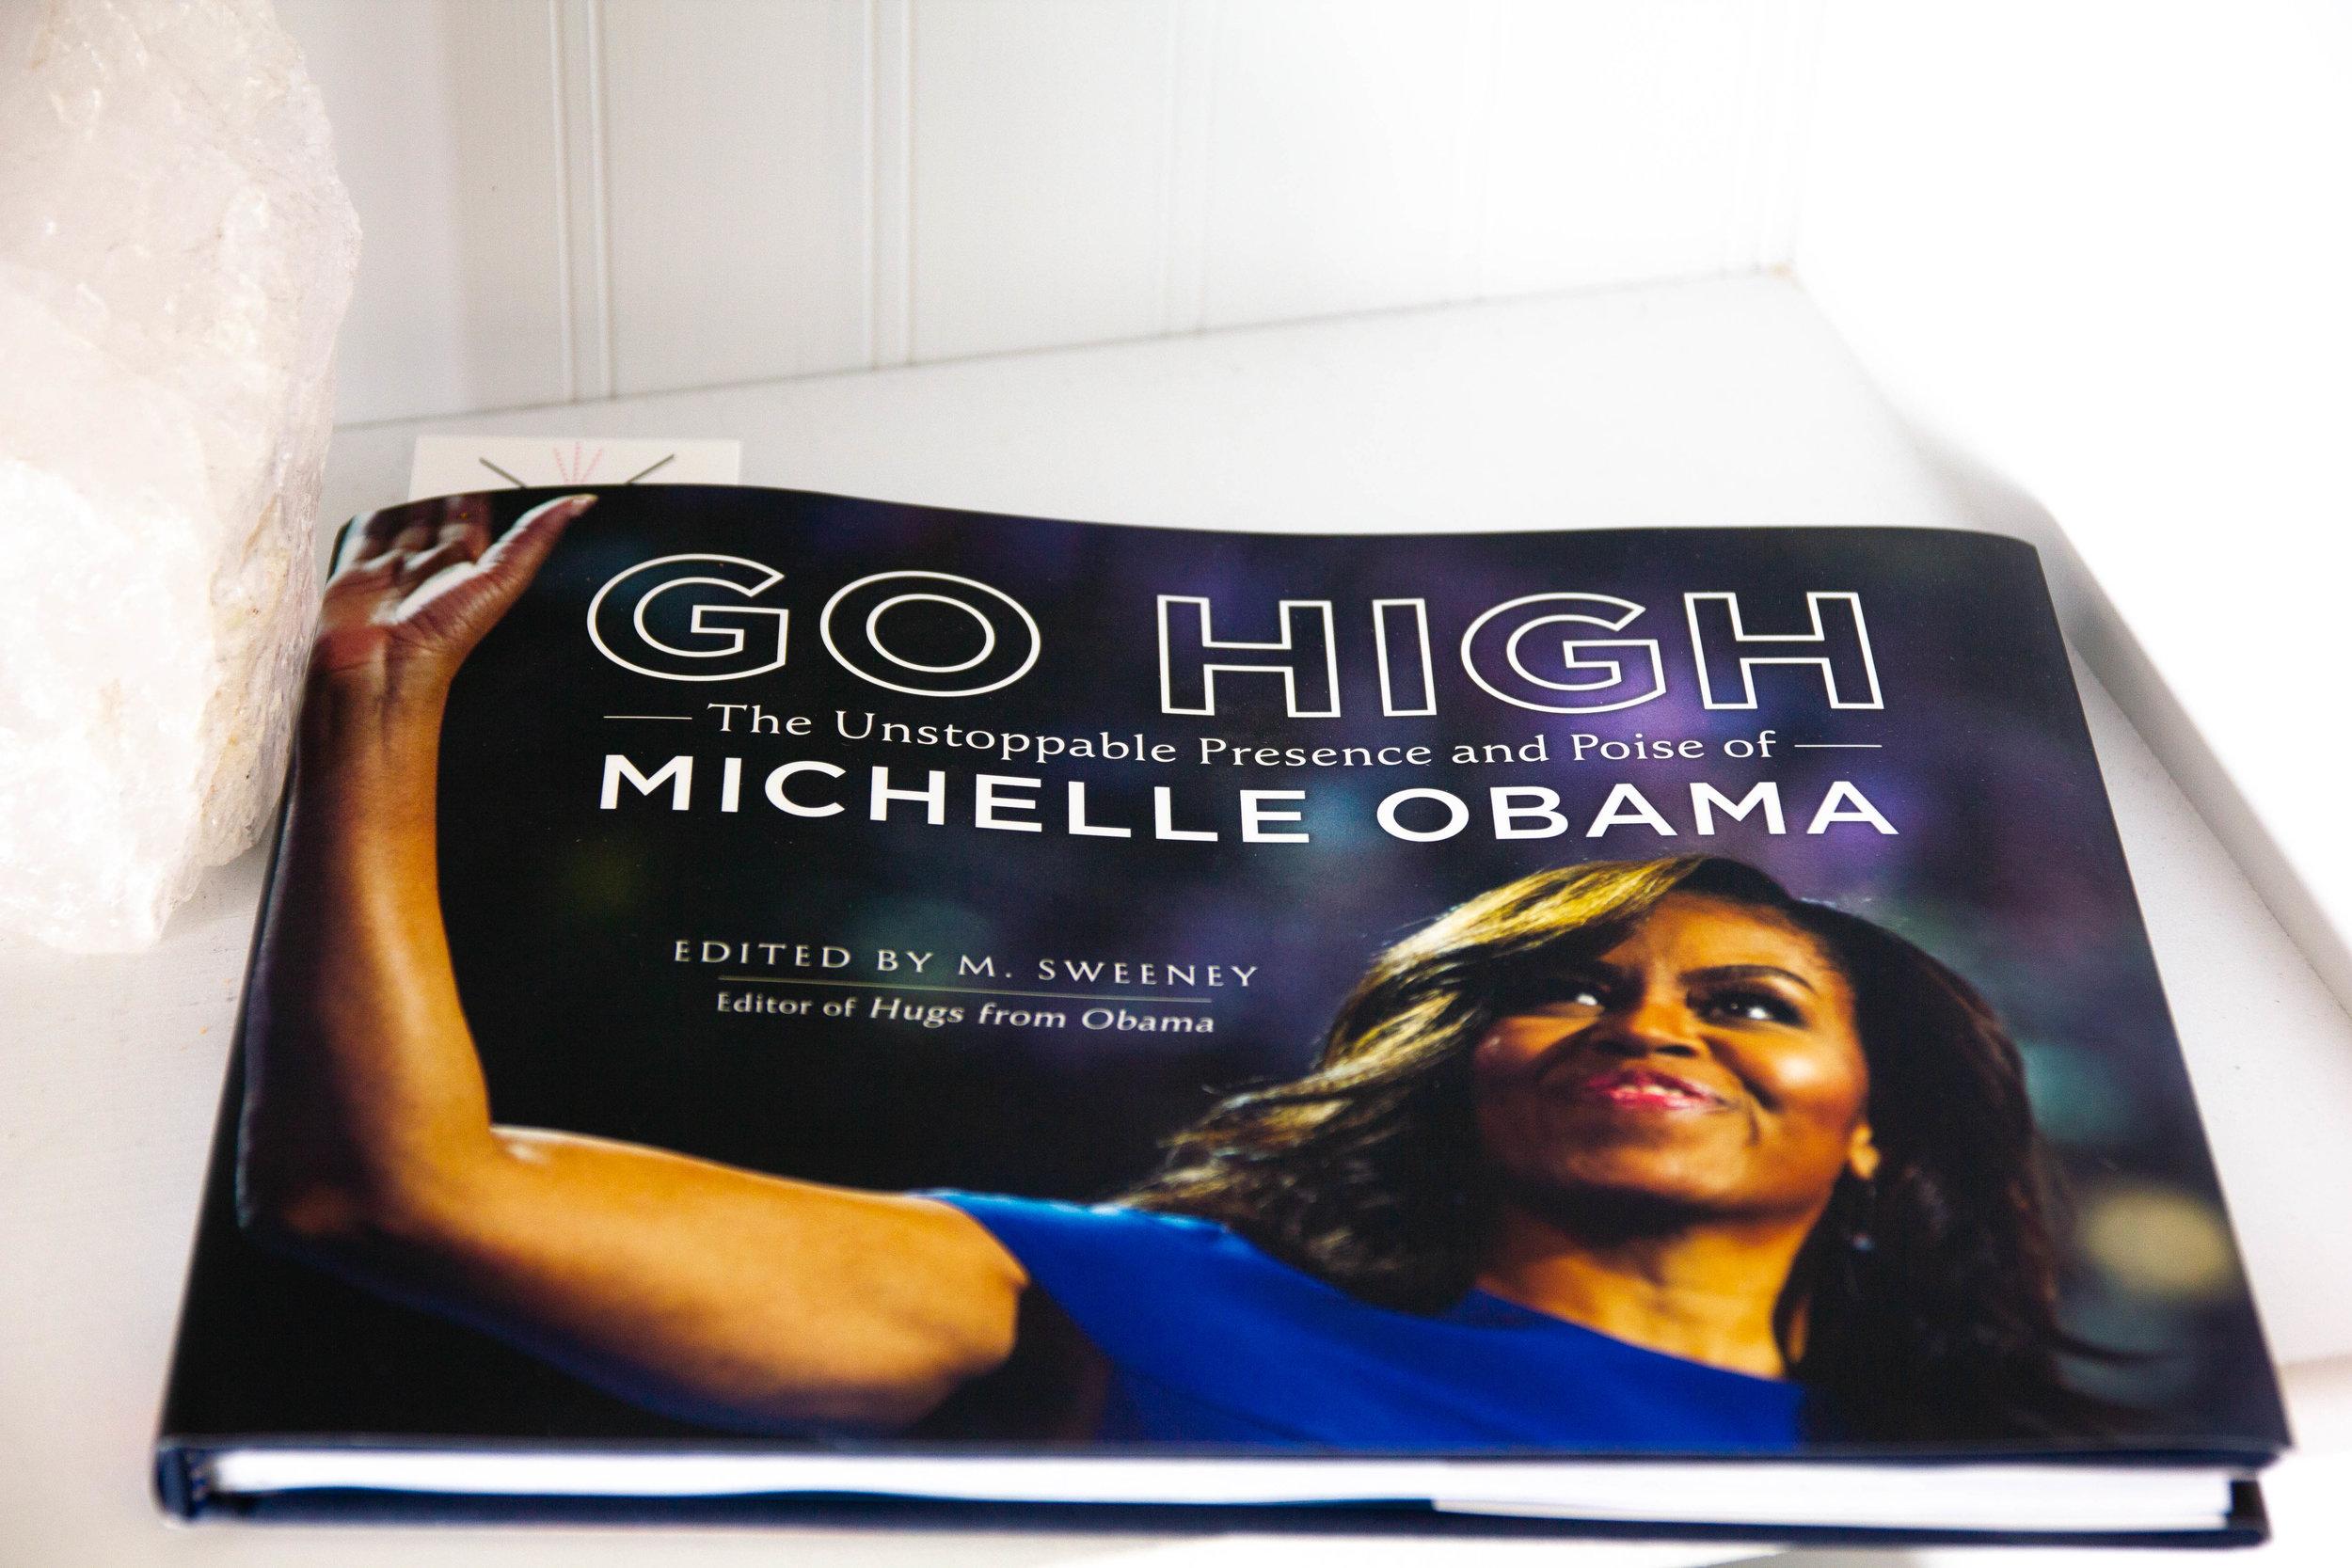 Go High Michelle Obama-3.jpg